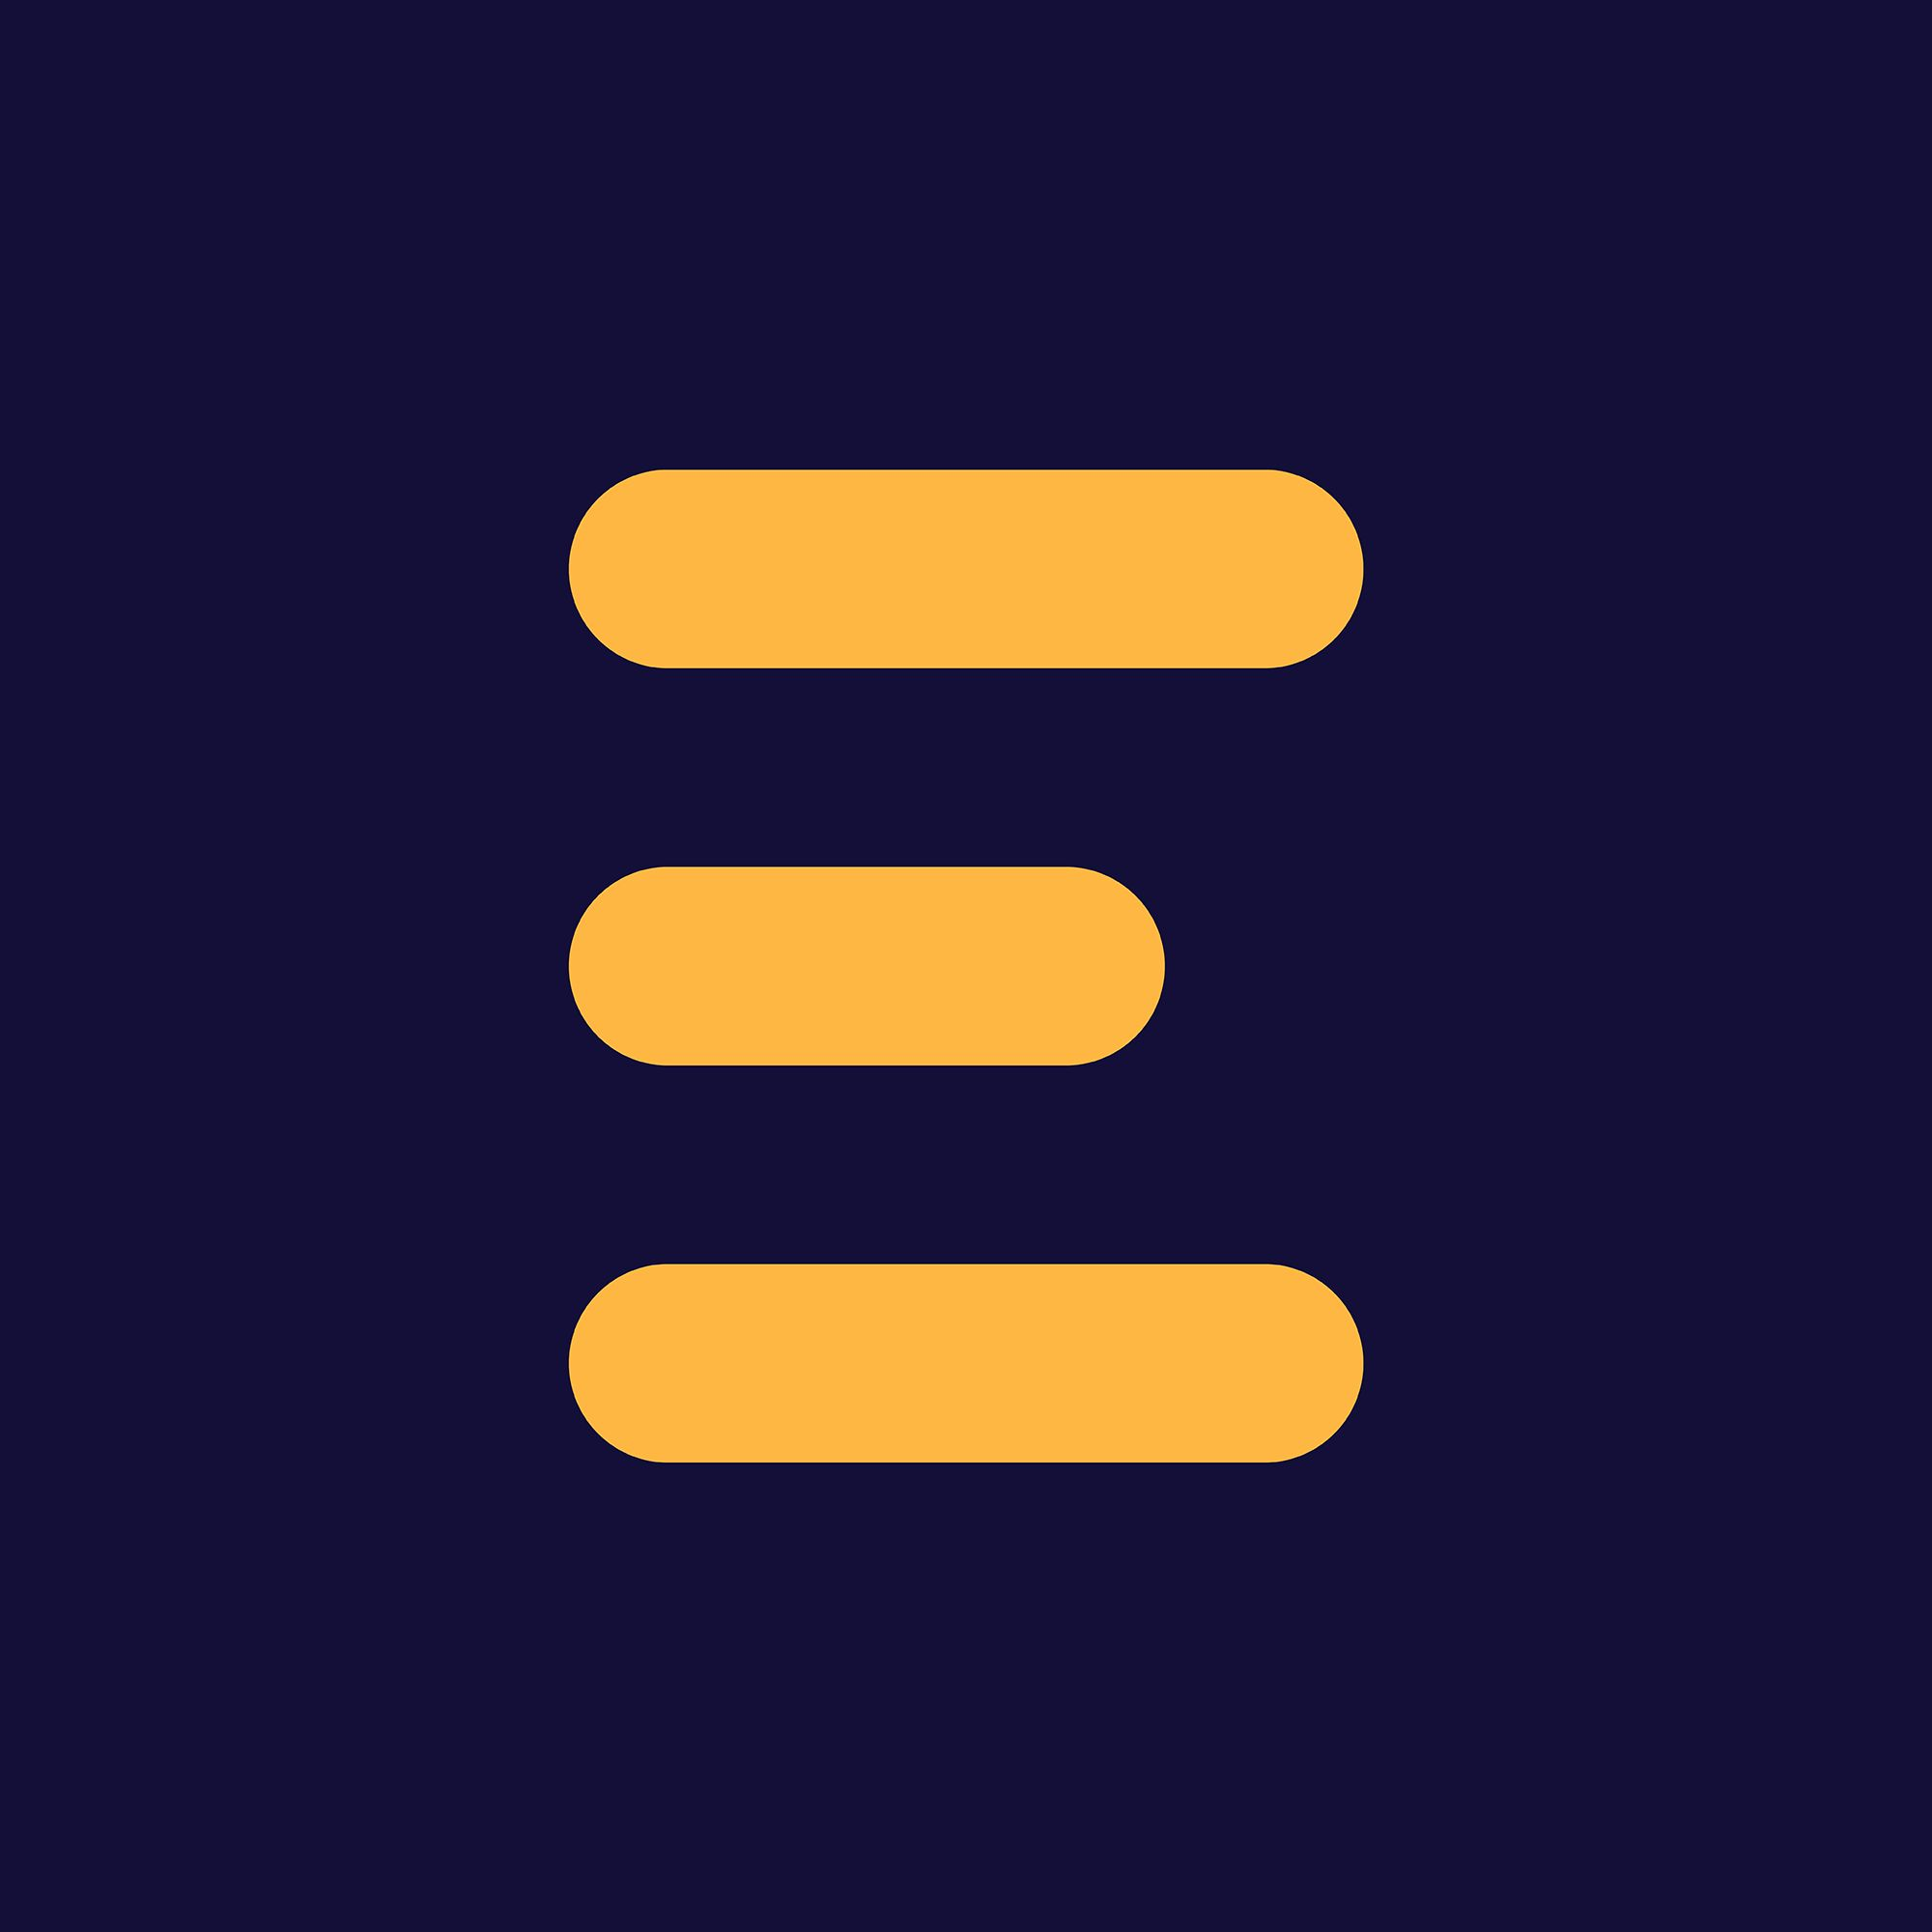 Engenius - Technology Podcast on Podchaser